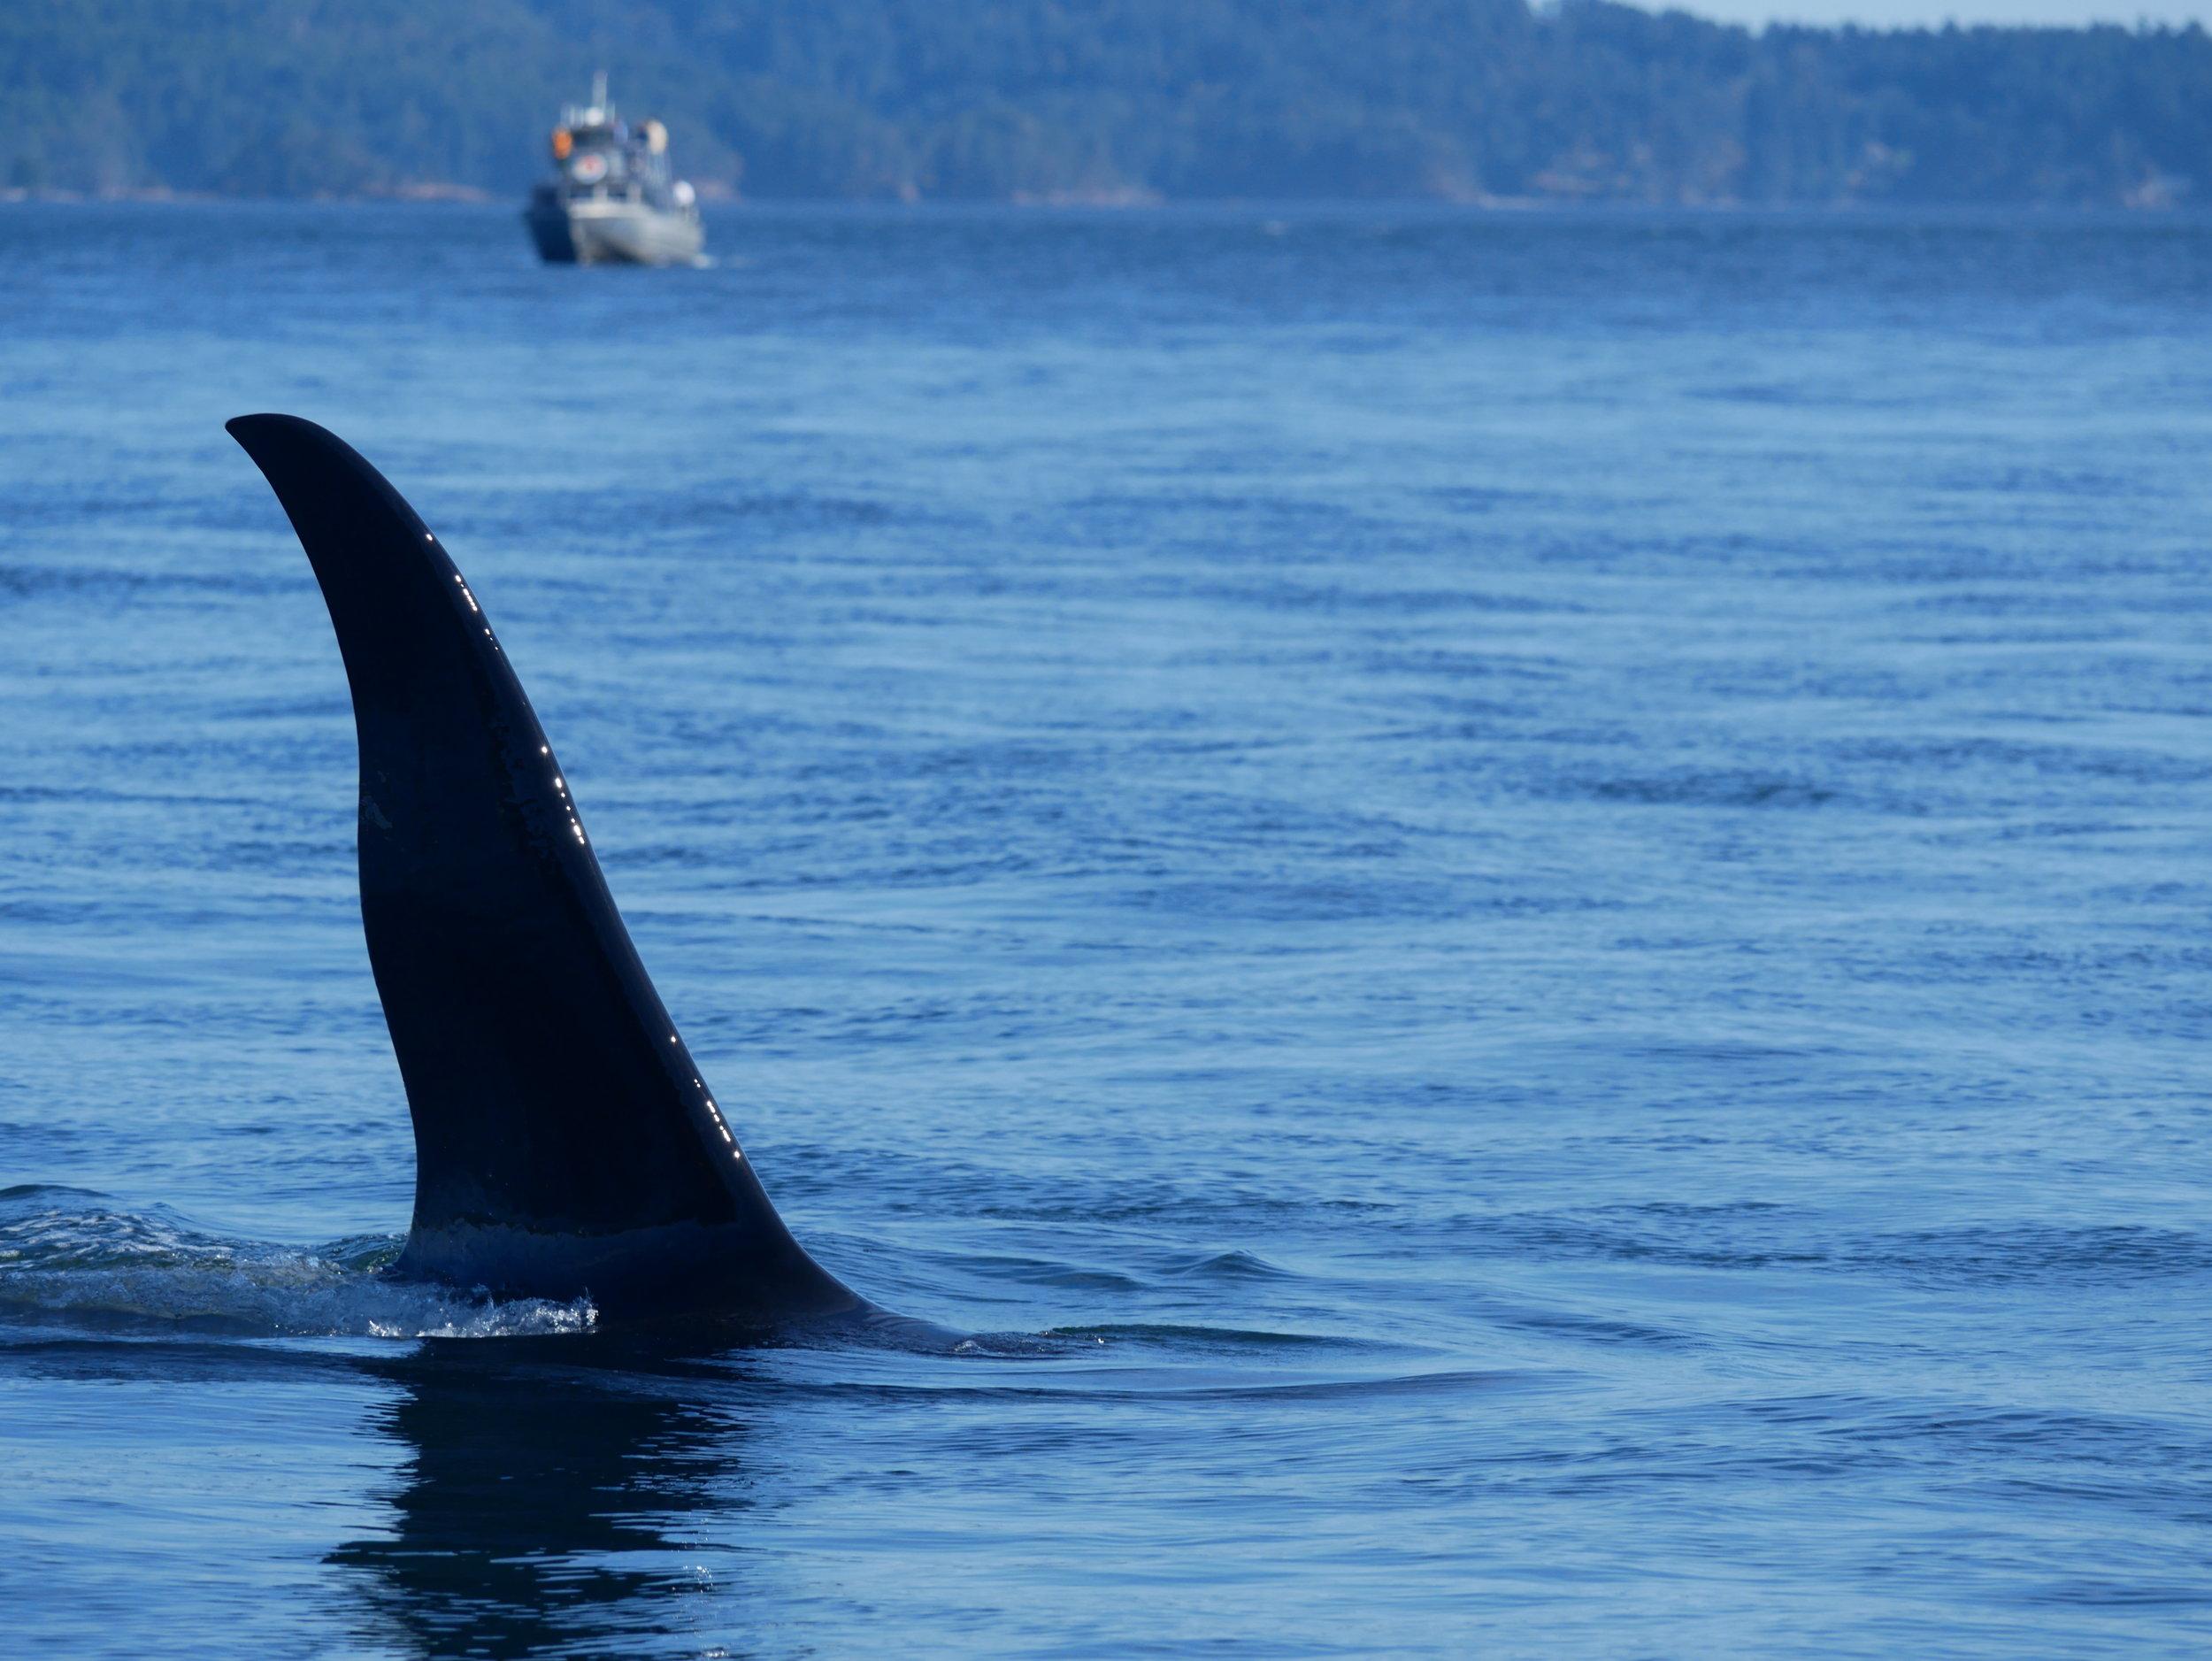 A six-foot tall dorsal fin slices through the surface. Photo by Alanna Vivani